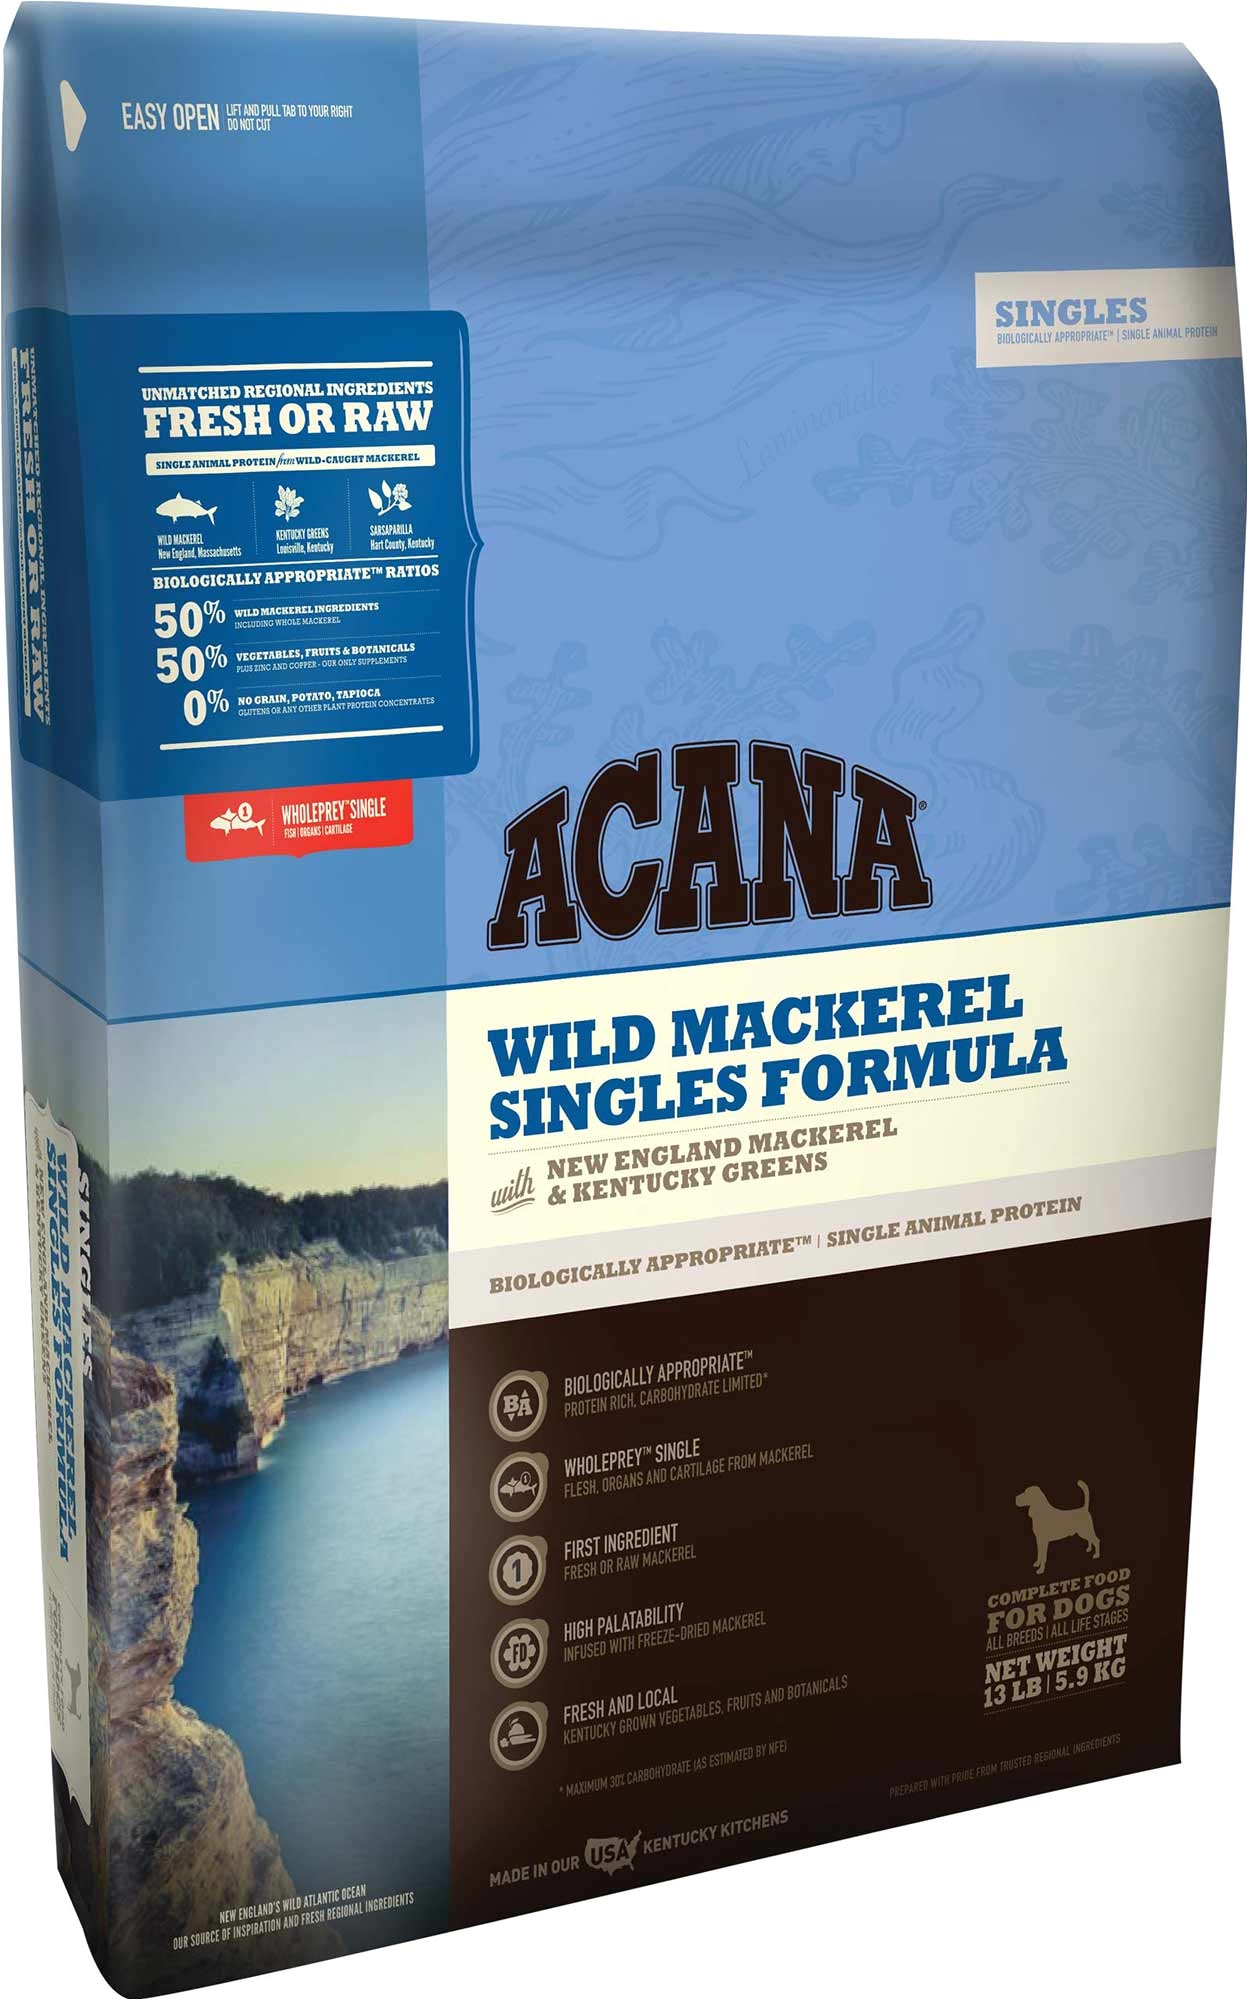 ds singles wild mackerel fr lg